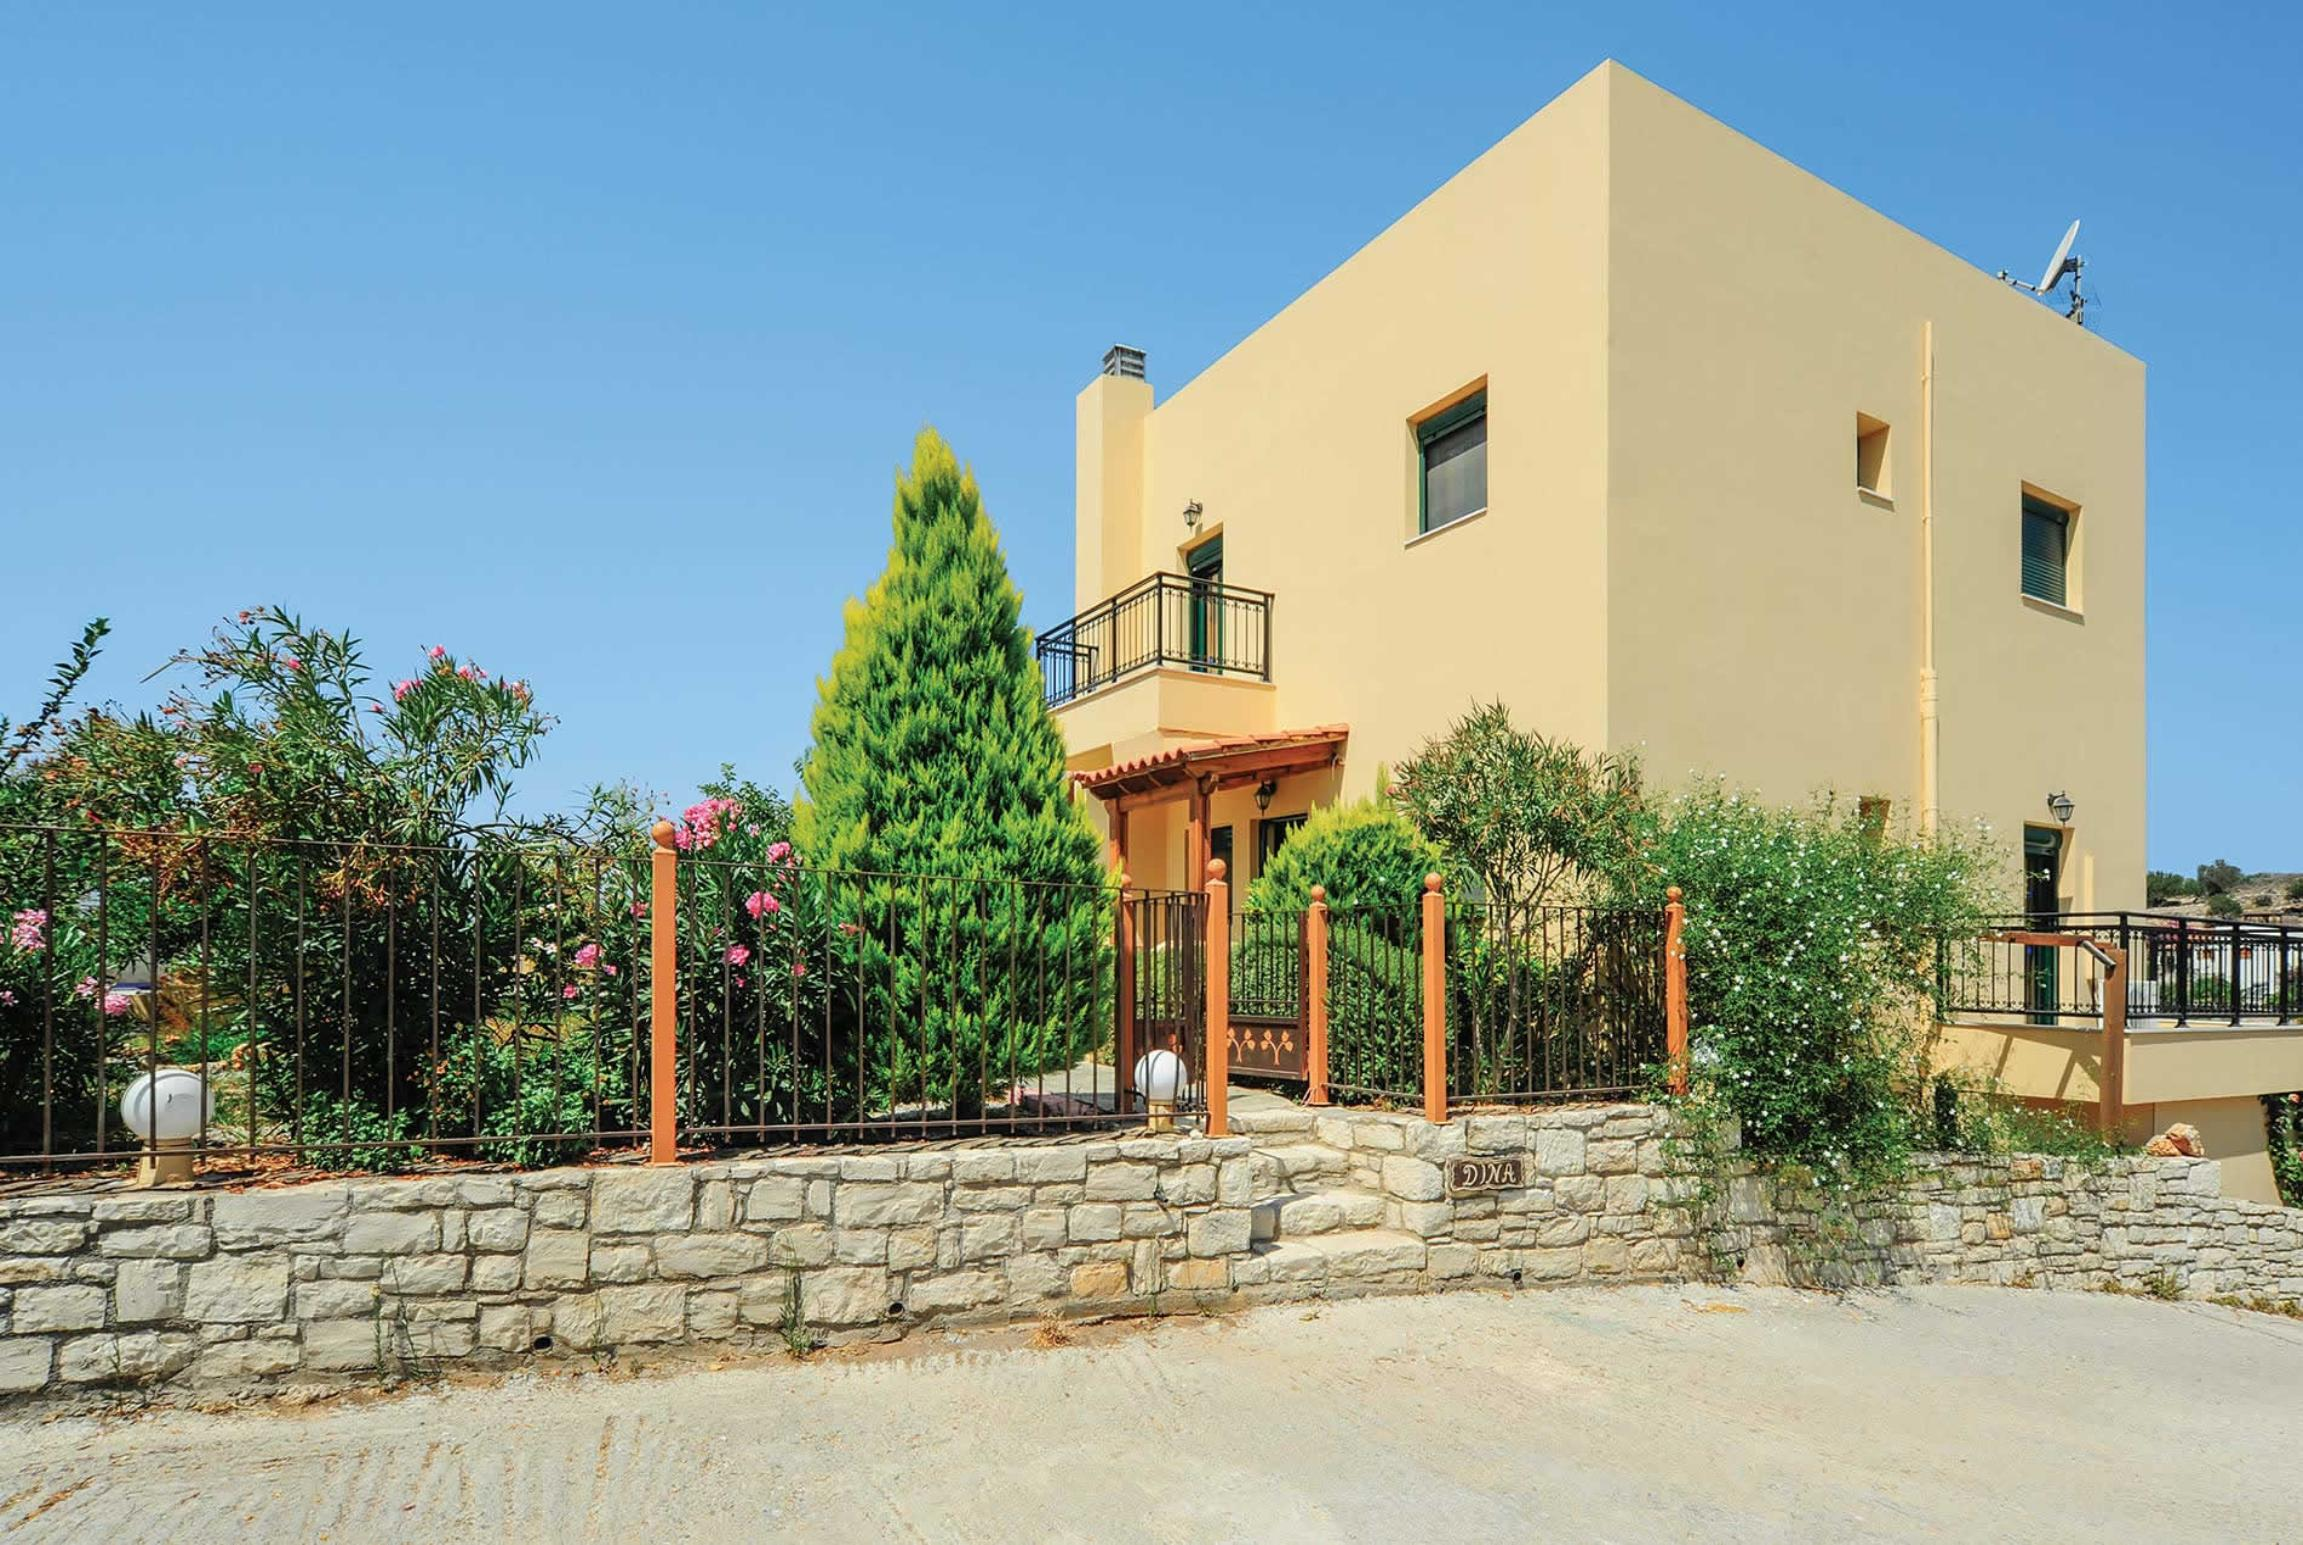 Ferienhaus Dina (2653758), Roumeli, Kreta Nordküste, Kreta, Griechenland, Bild 19